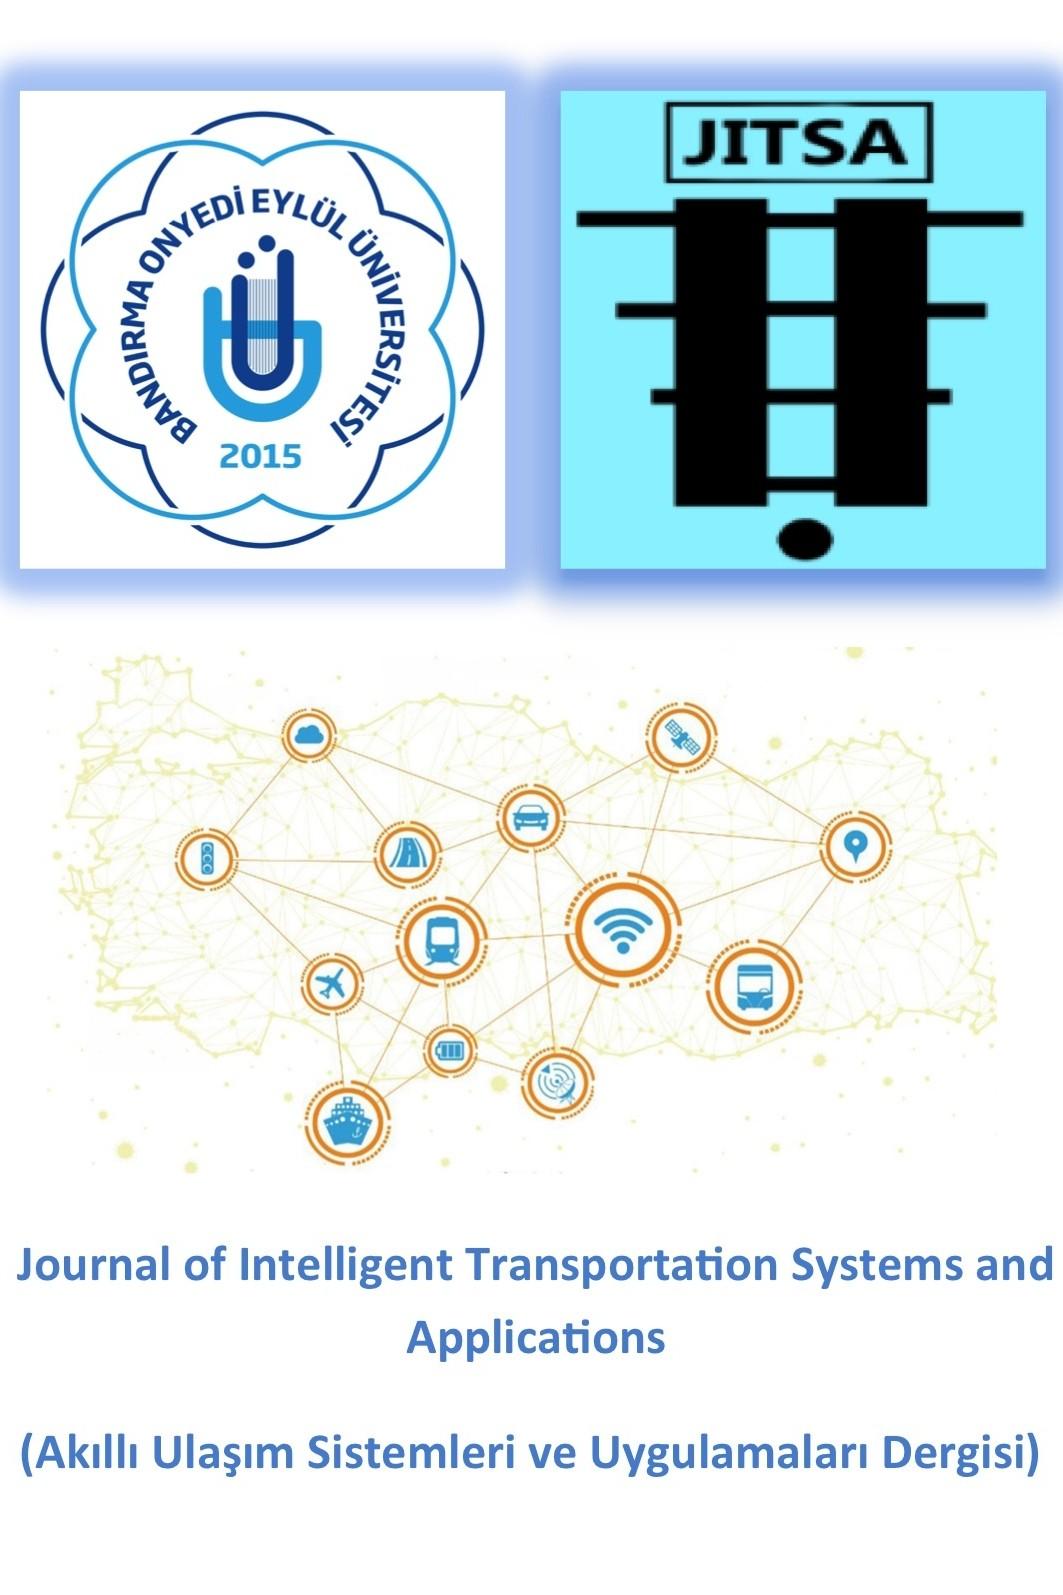 Akıllı Ulaşım Sistemleri ve Uygulamaları Dergisi – (Journal of Intelligent Transportation Systems and Applications)